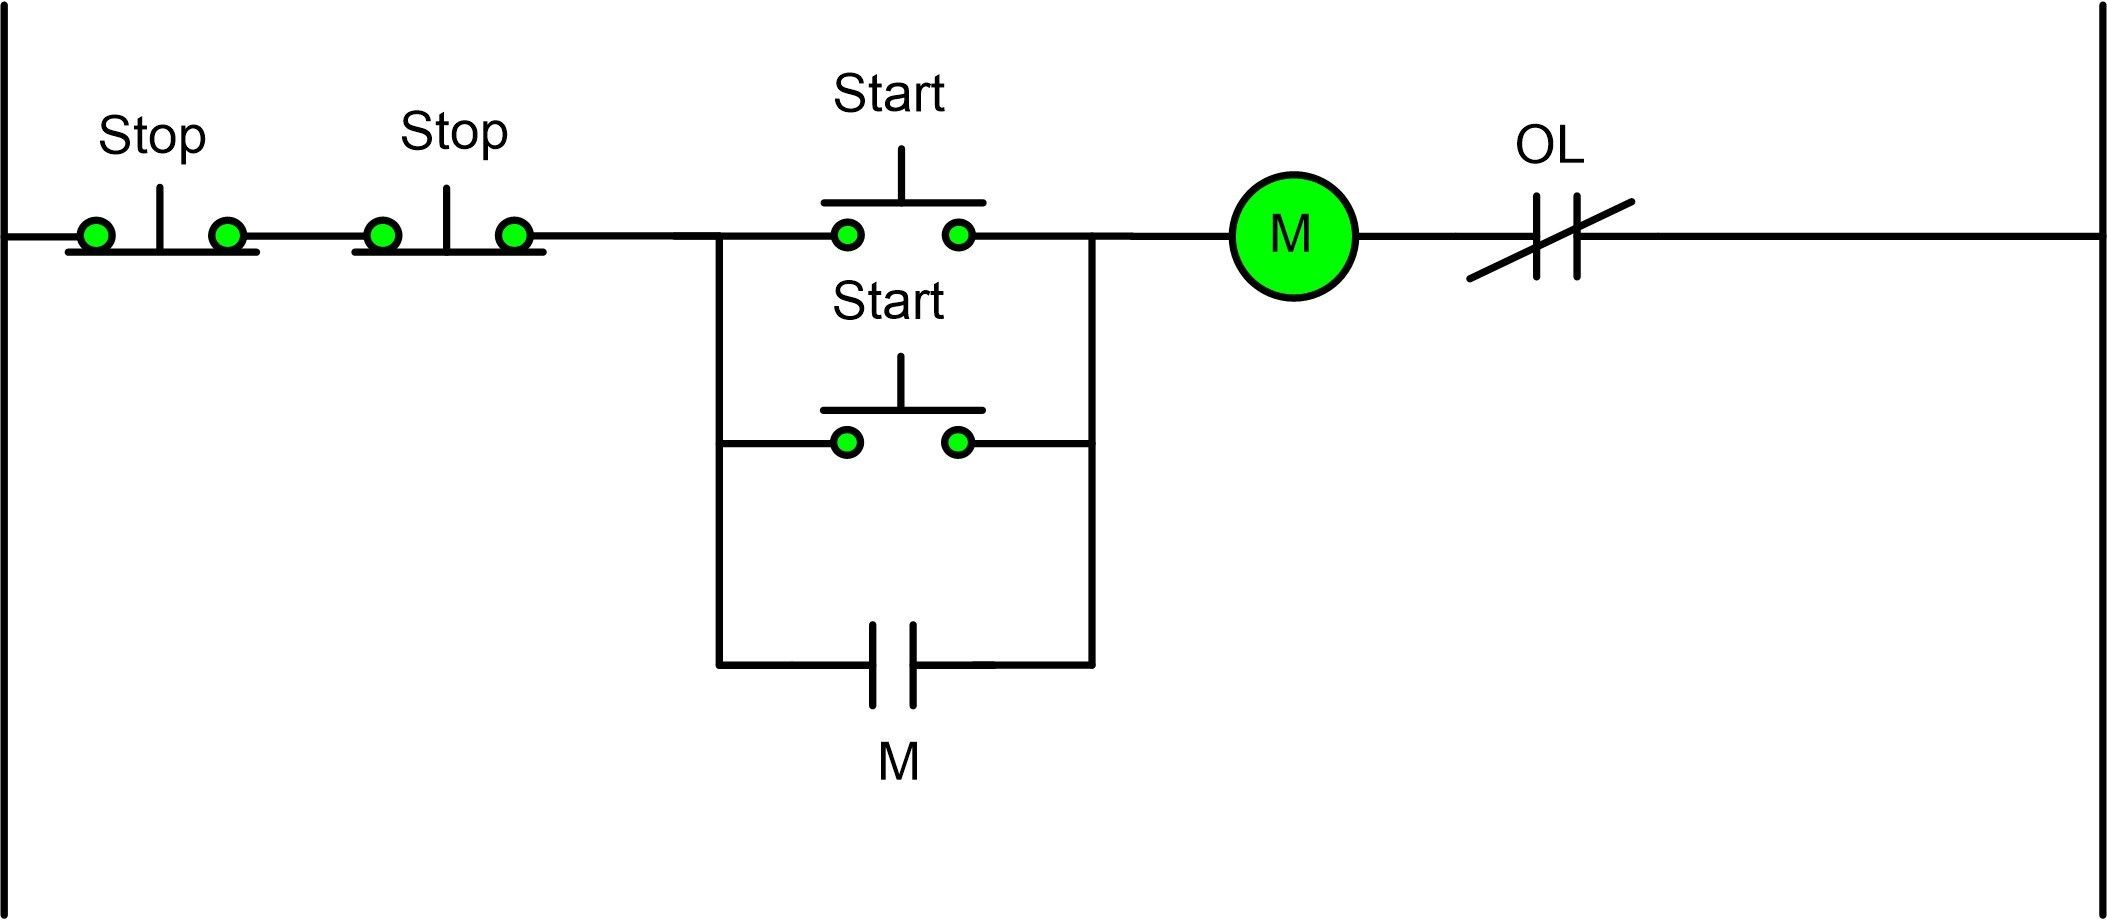 New Wiring Diagram Definition Diagram Wiringdiagram Diagramming Diagramm Visuals Visualisation Graphical Diagram Diagram Chart Diagram Design